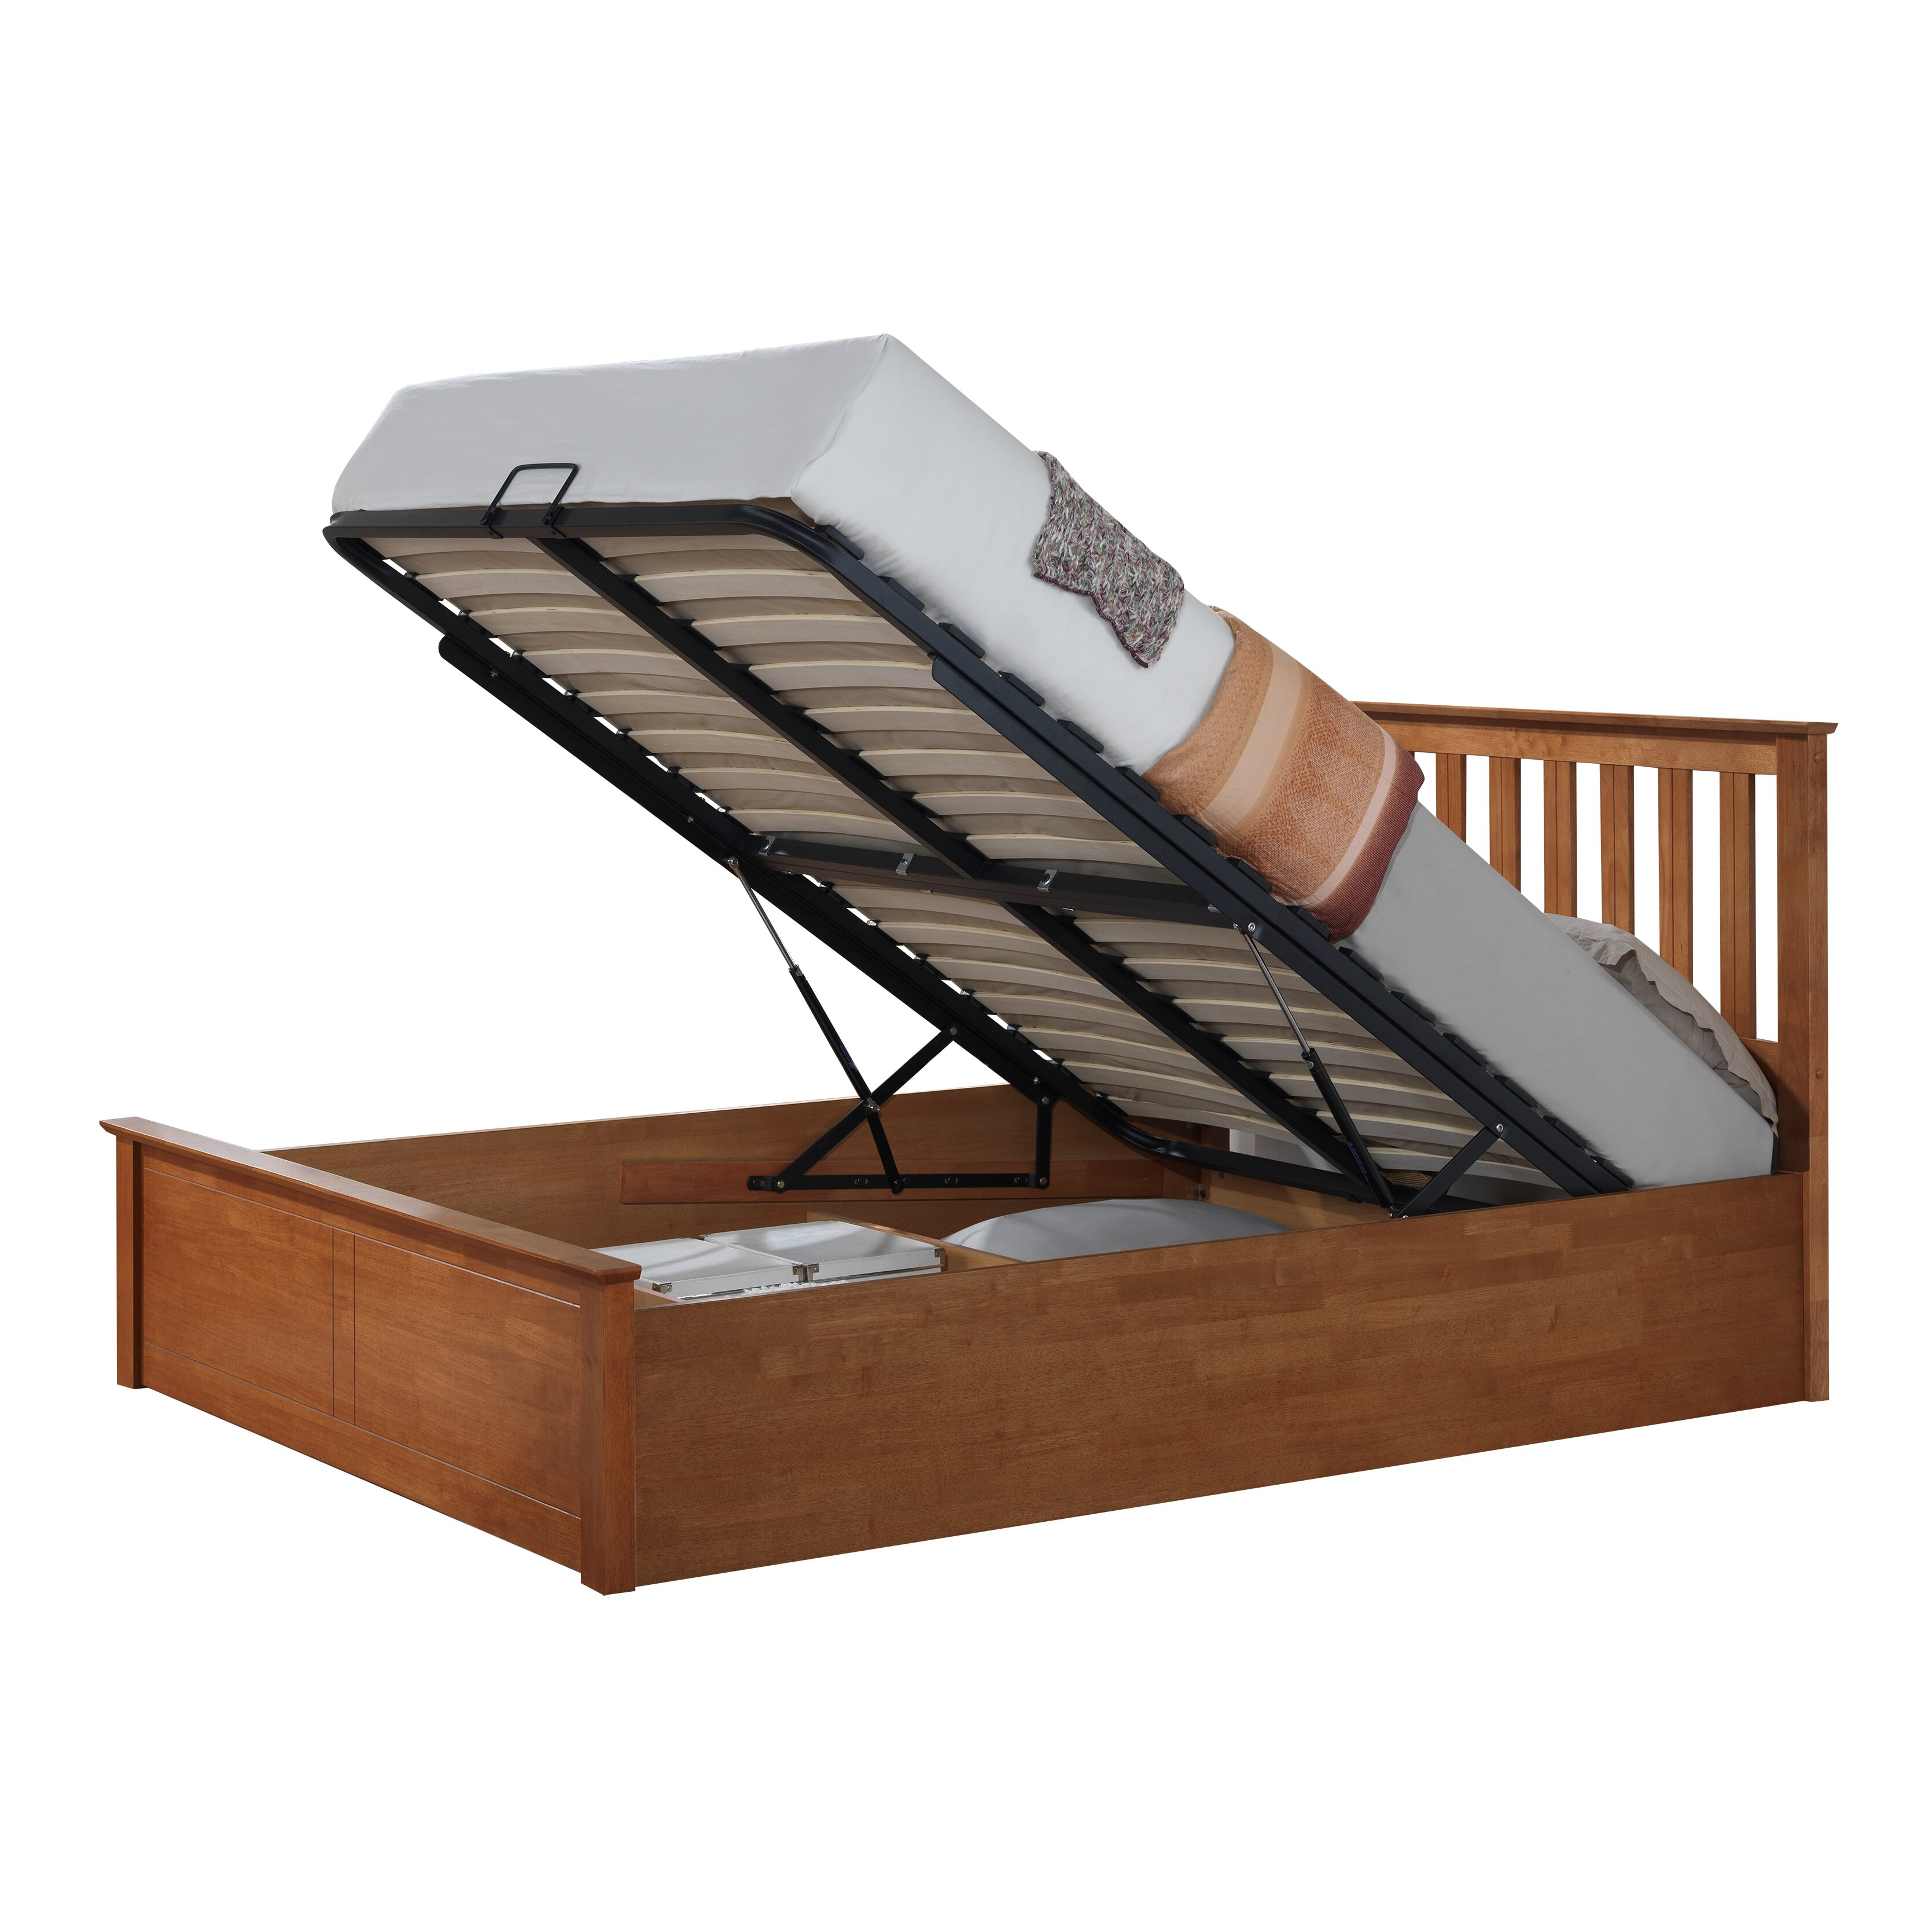 Home & Haus Arizona Ottoman Bed & Reviews